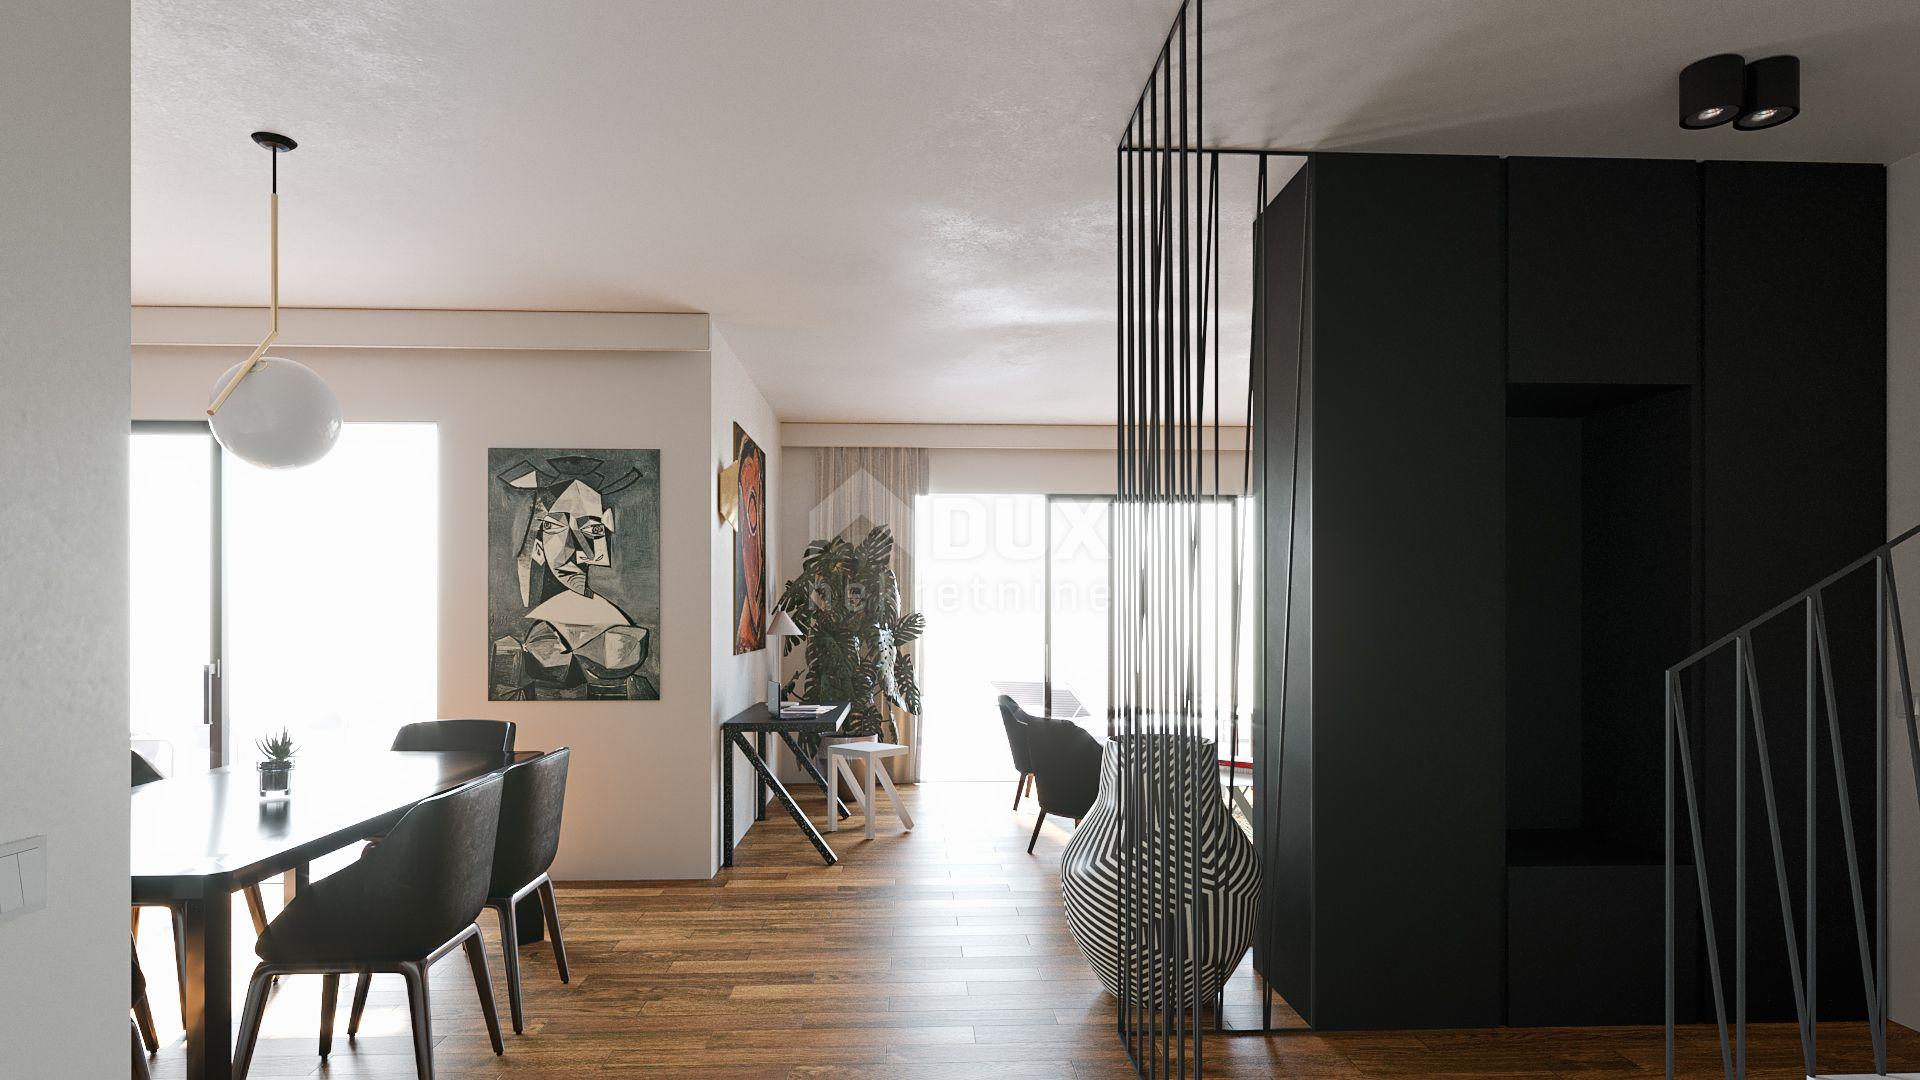 KOSTRENA - luksuzna rezidencija u atraktivnoj vili - bazen, garaža, panoramski pogled na more